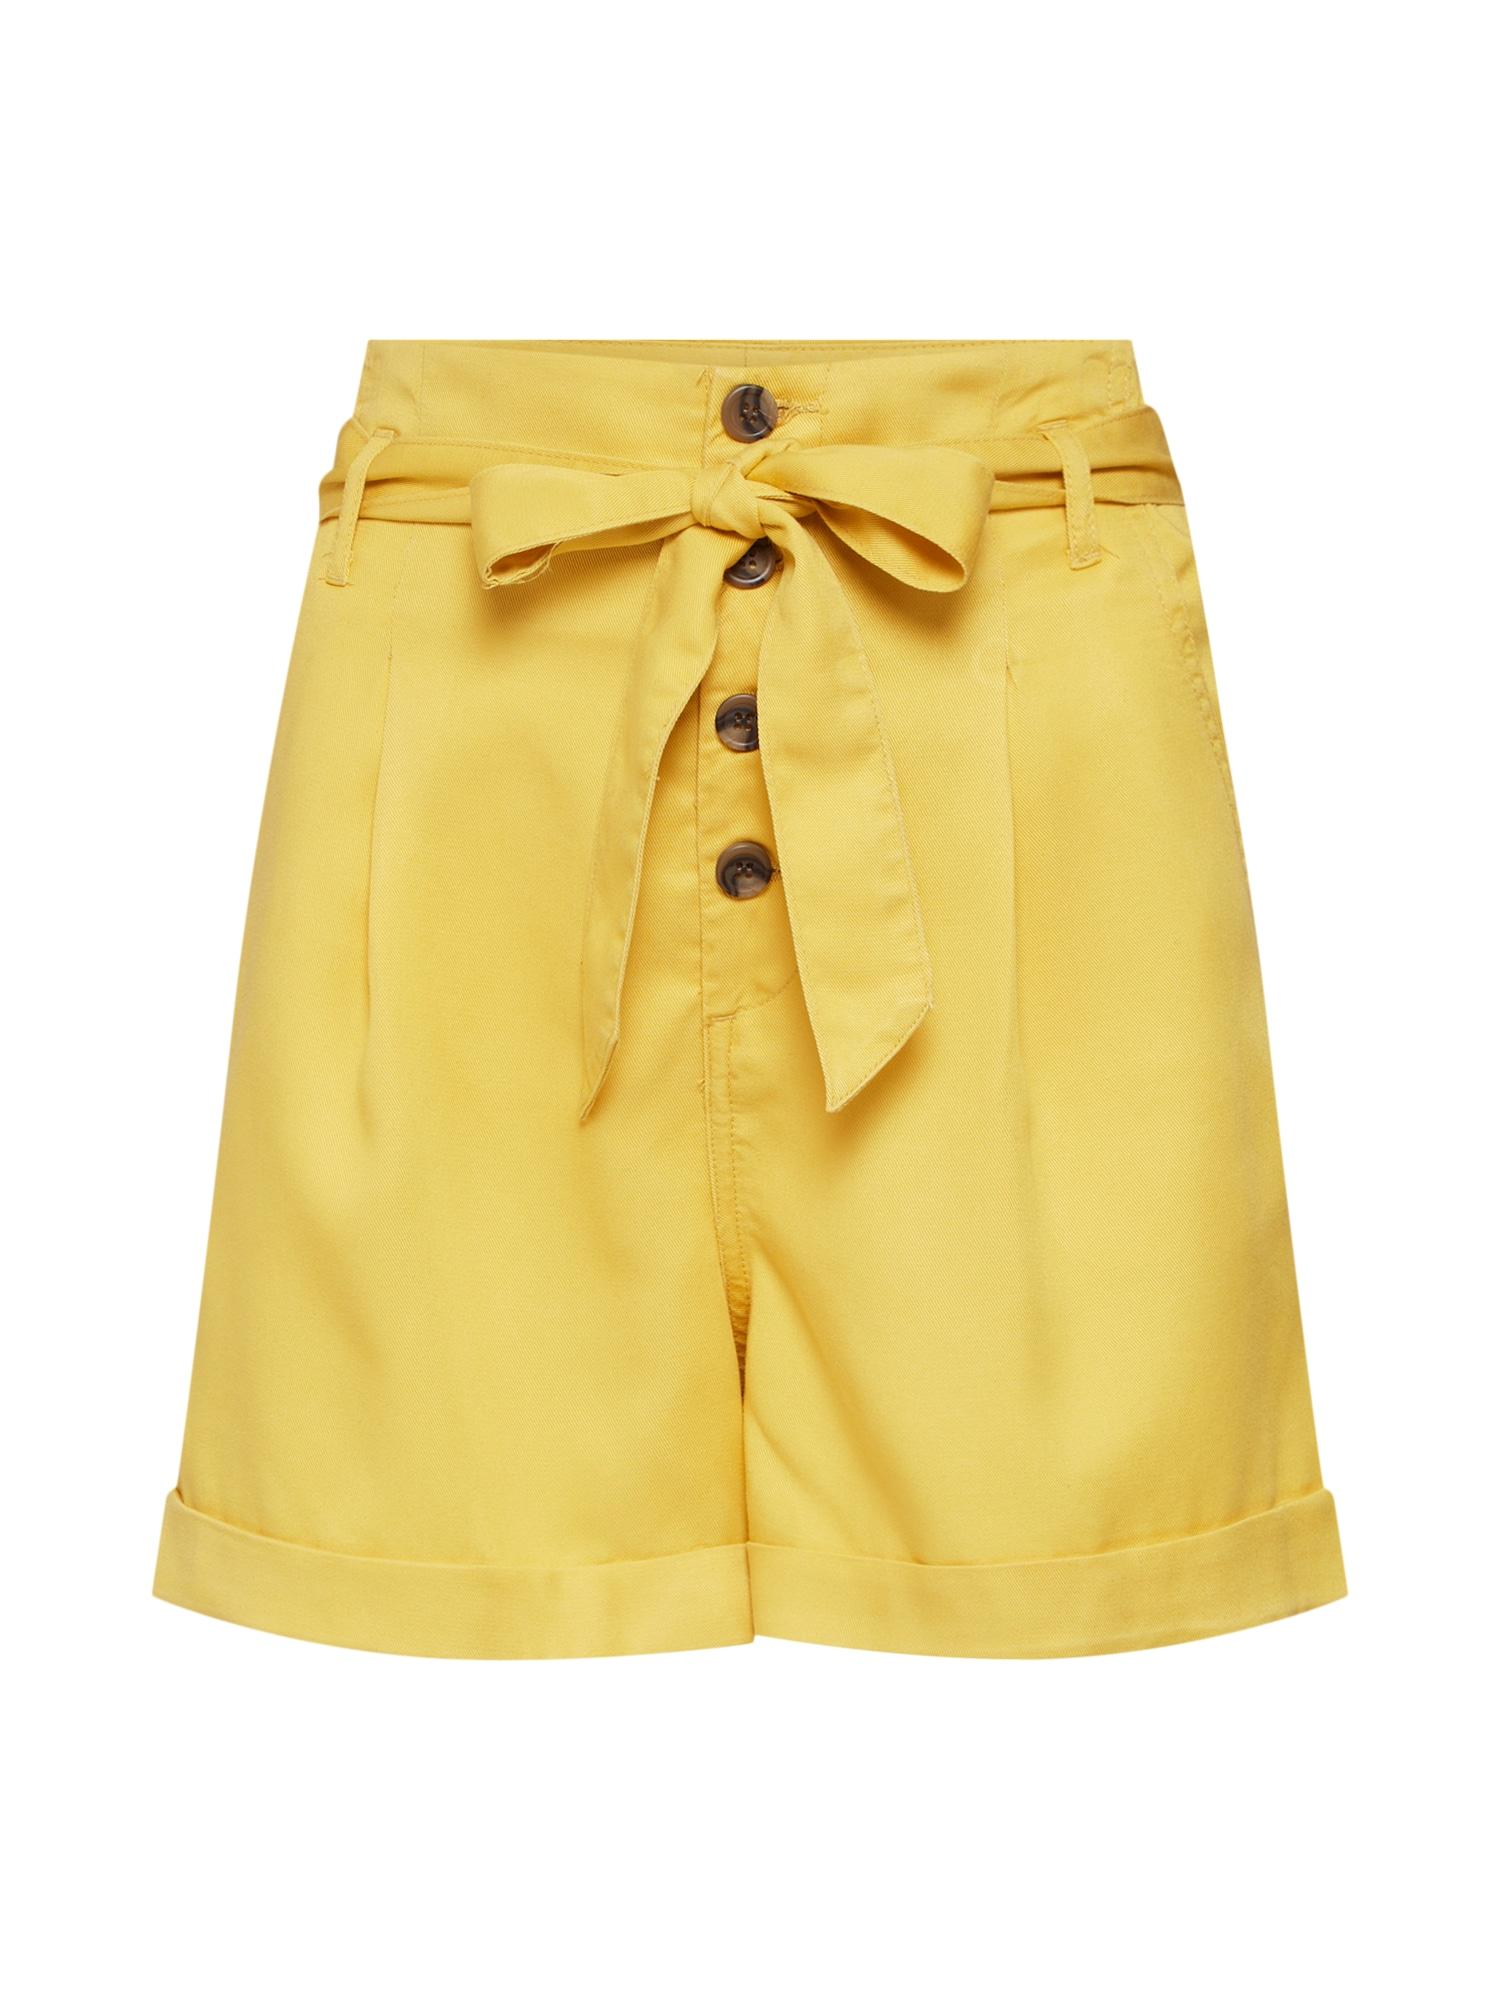 Kalhoty se sklady v pase onlSIRI HW BELT SHORTS PNT BJ14053 žlutá ONLY